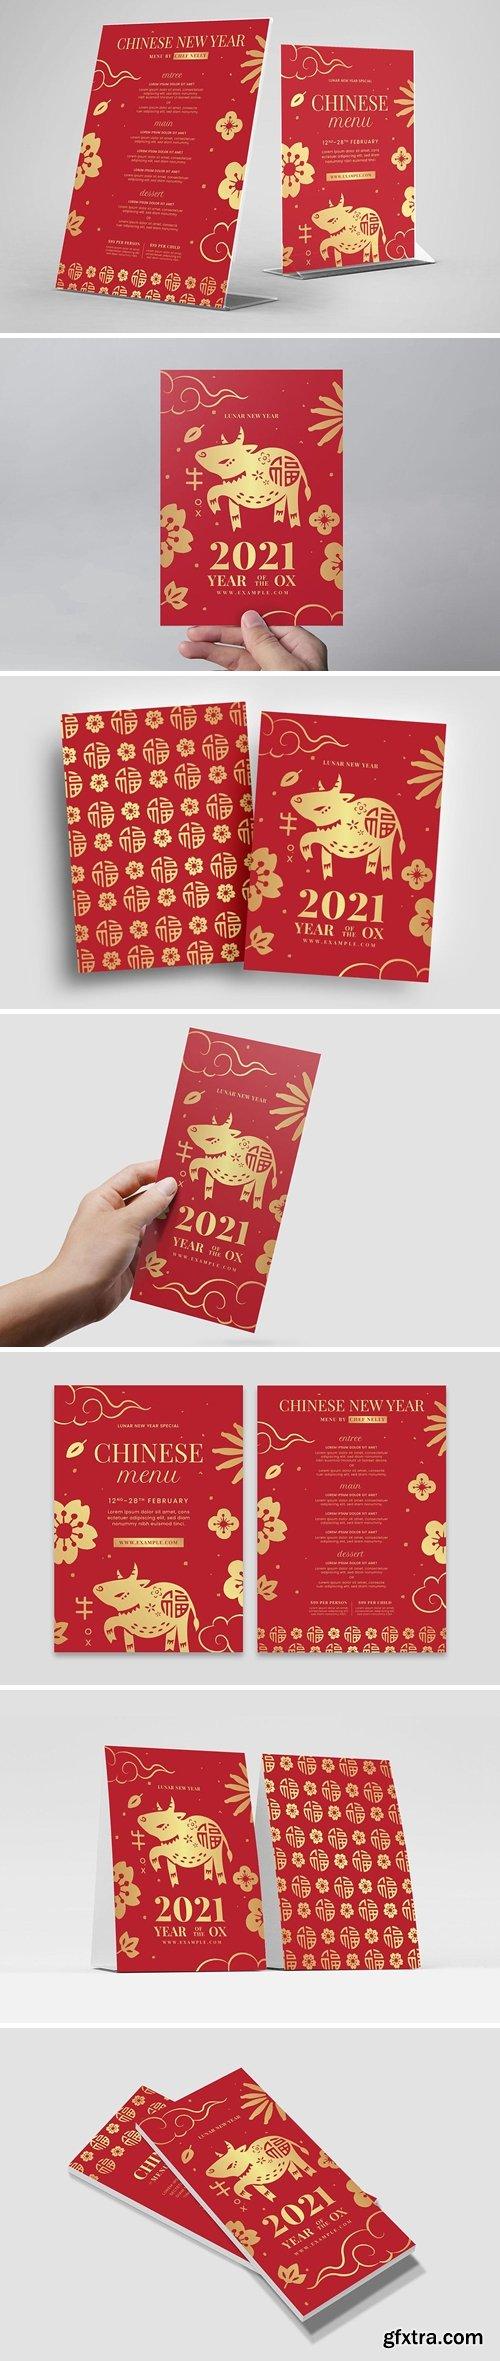 Chinese Lunar New Year Zodiac Template